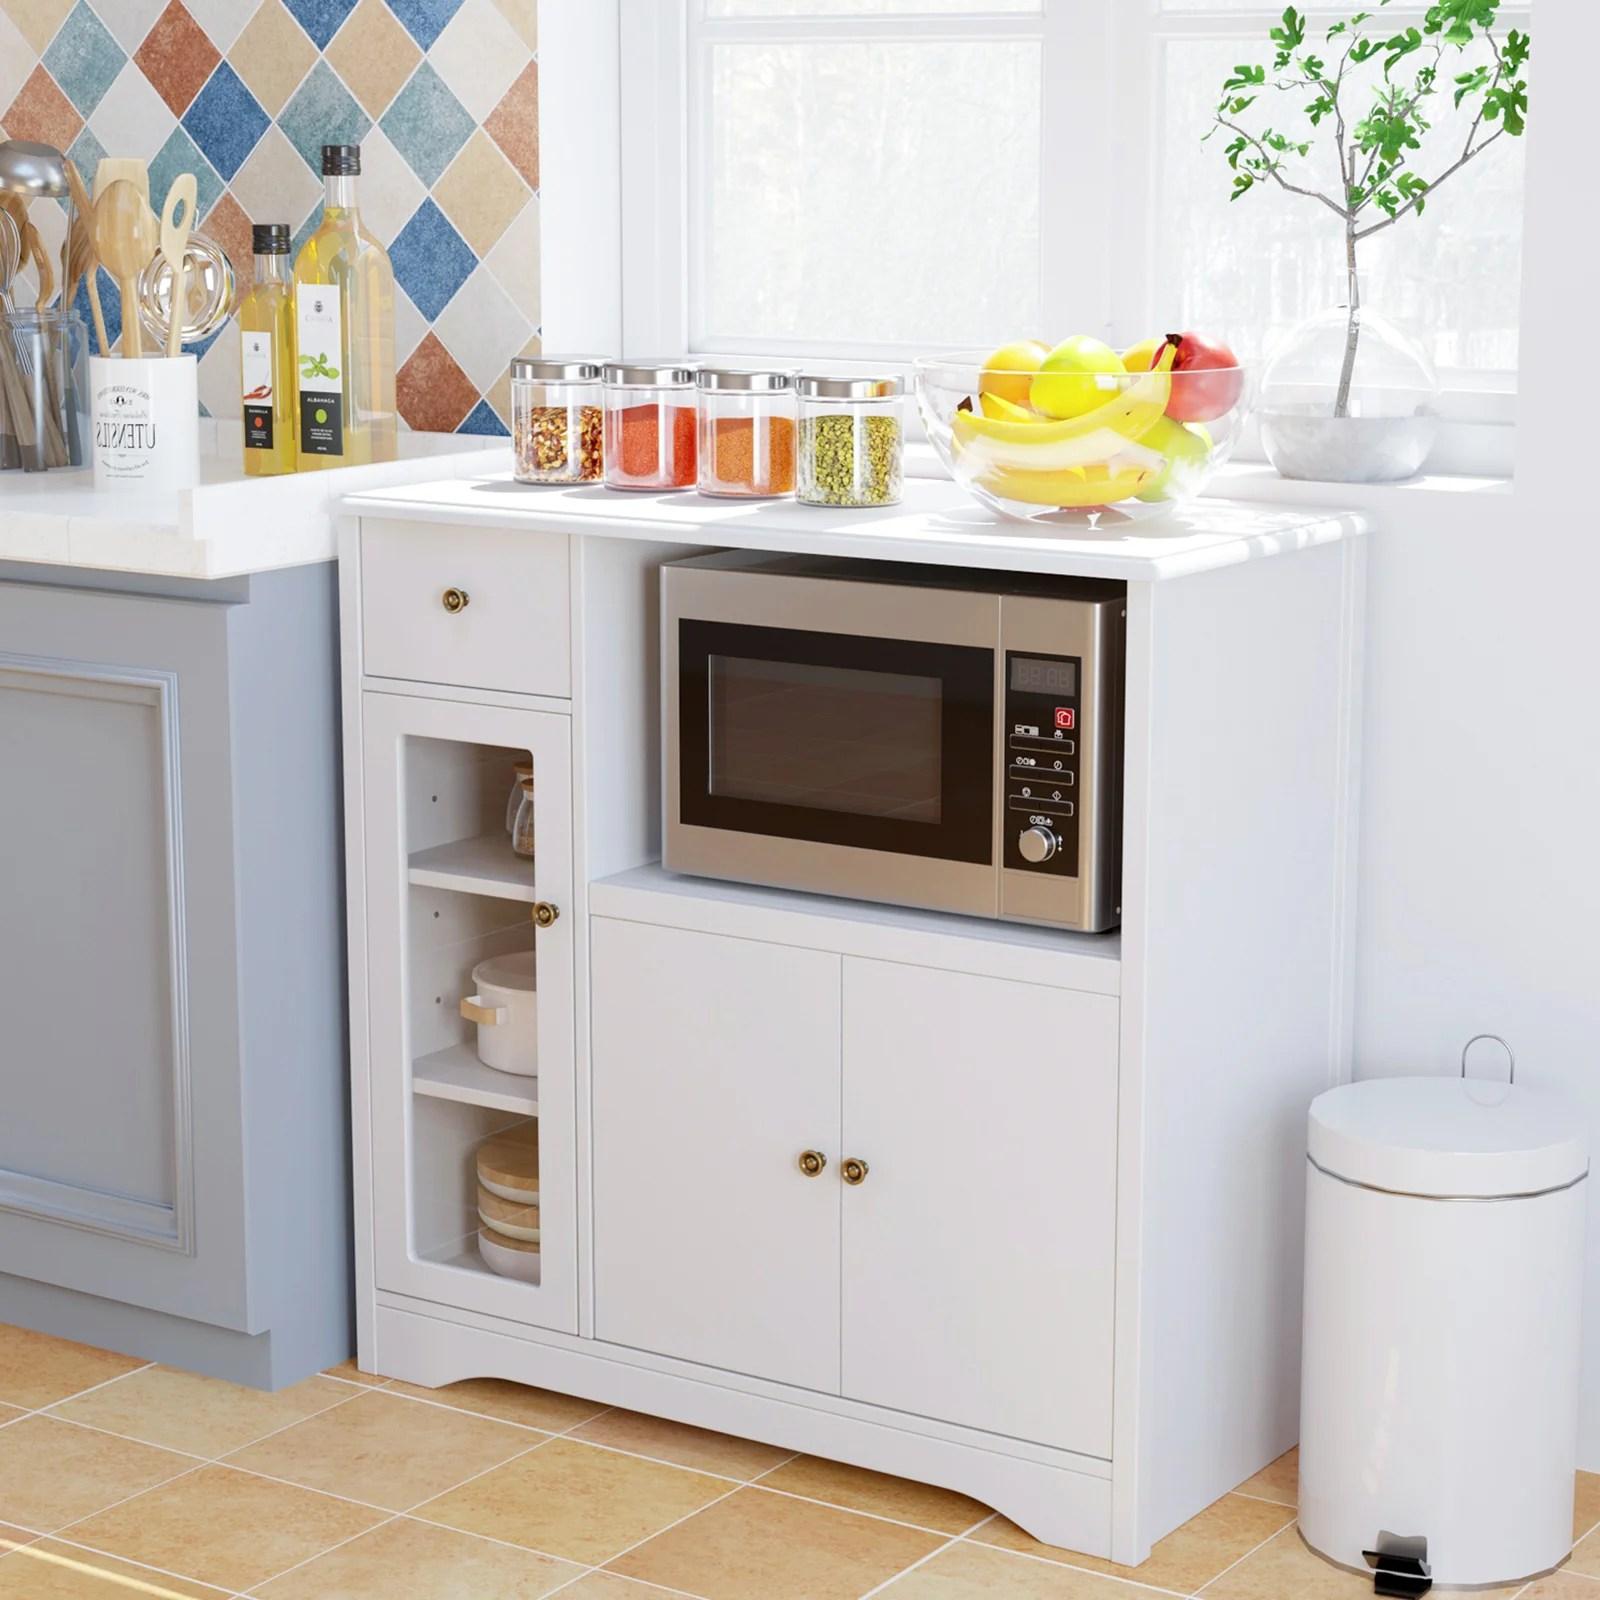 32 kitchen pantry